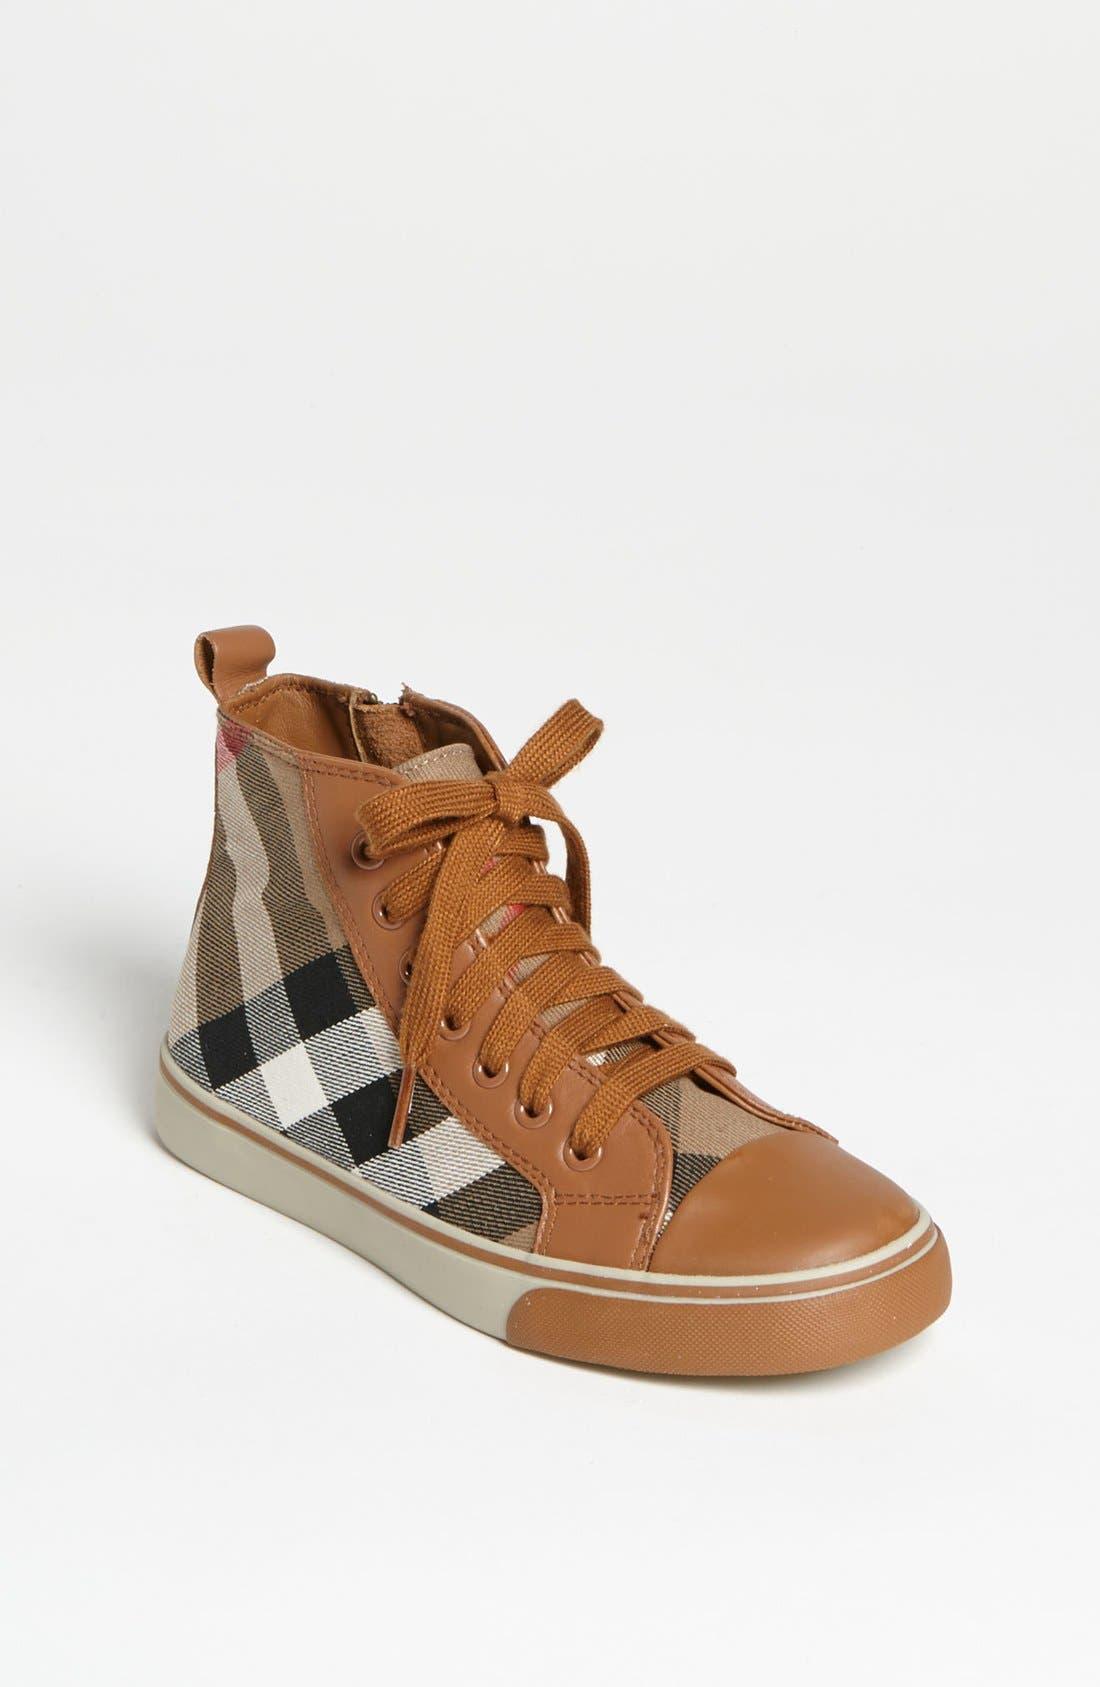 Main Image - Burberry 'Tom' High Top Sneaker (Walker, Toddler, Little Kid & Big Kid)